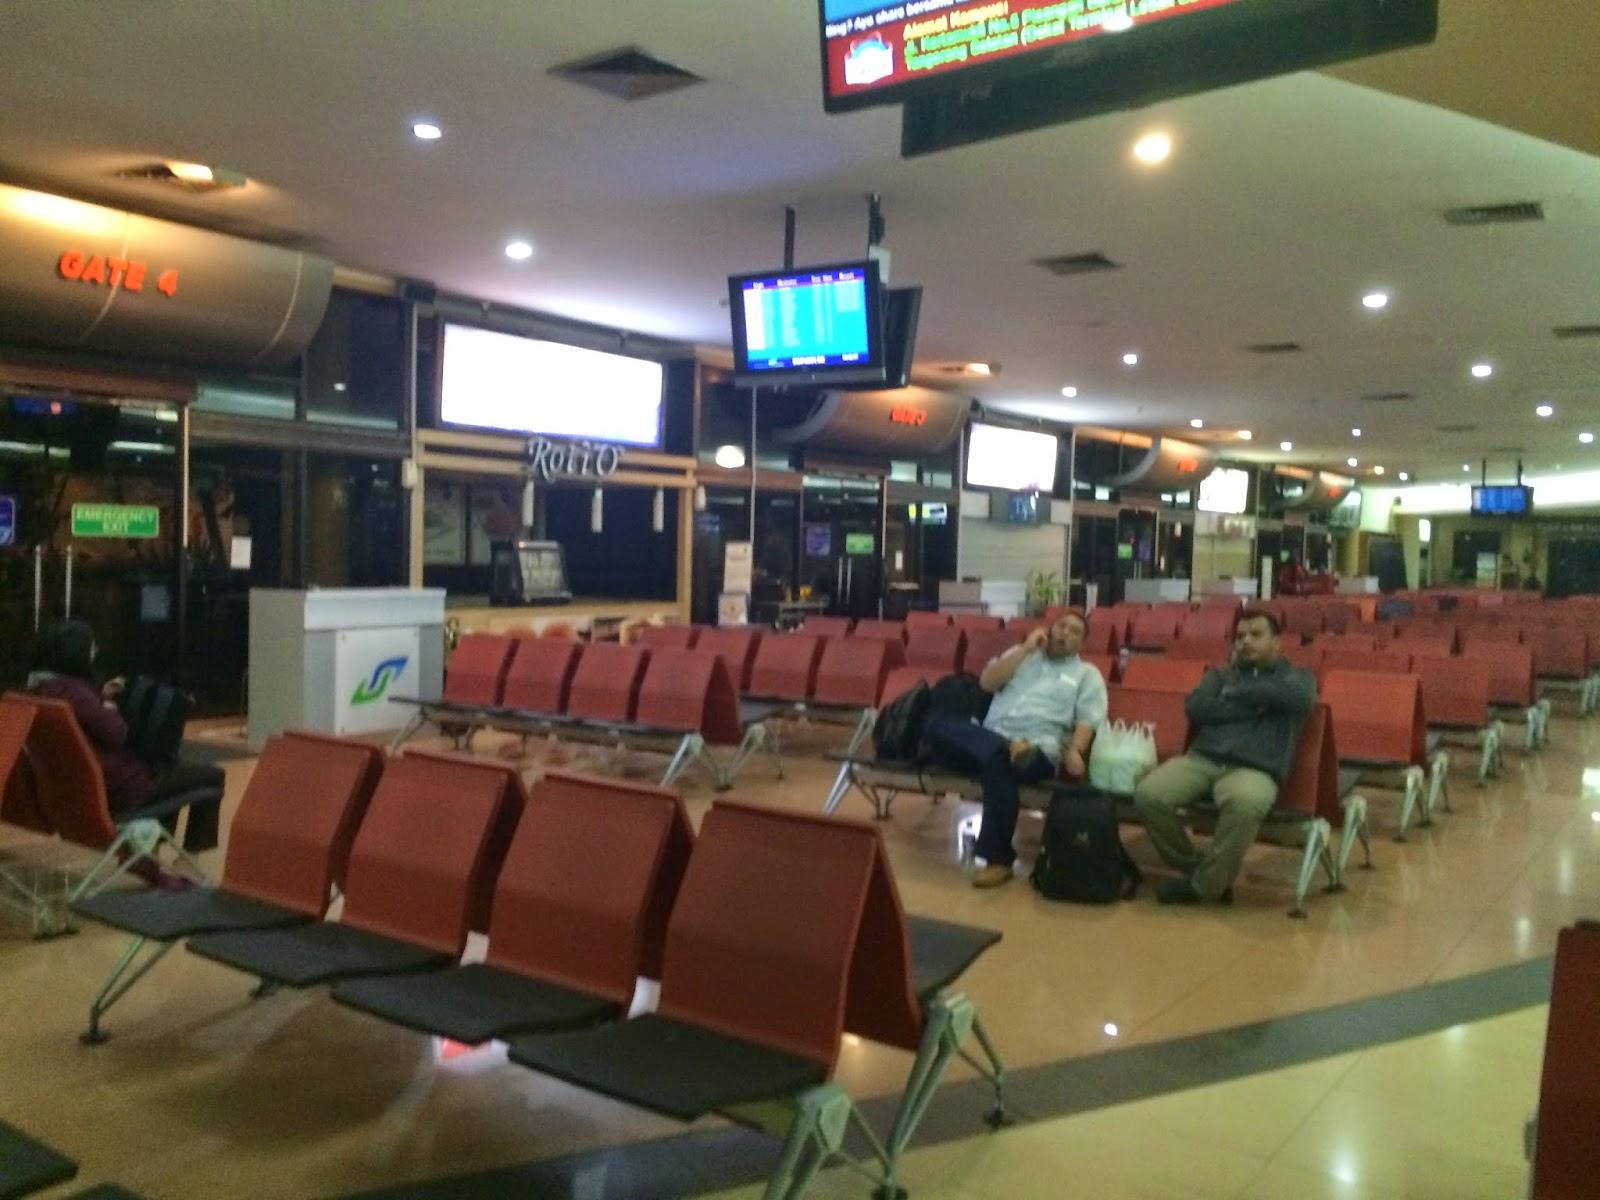 cara naik pesawat jogja jakarta rh marialydiap blogspot com harga tiket pesawat jakarta jogja via halim Harga Tiket Pesawat